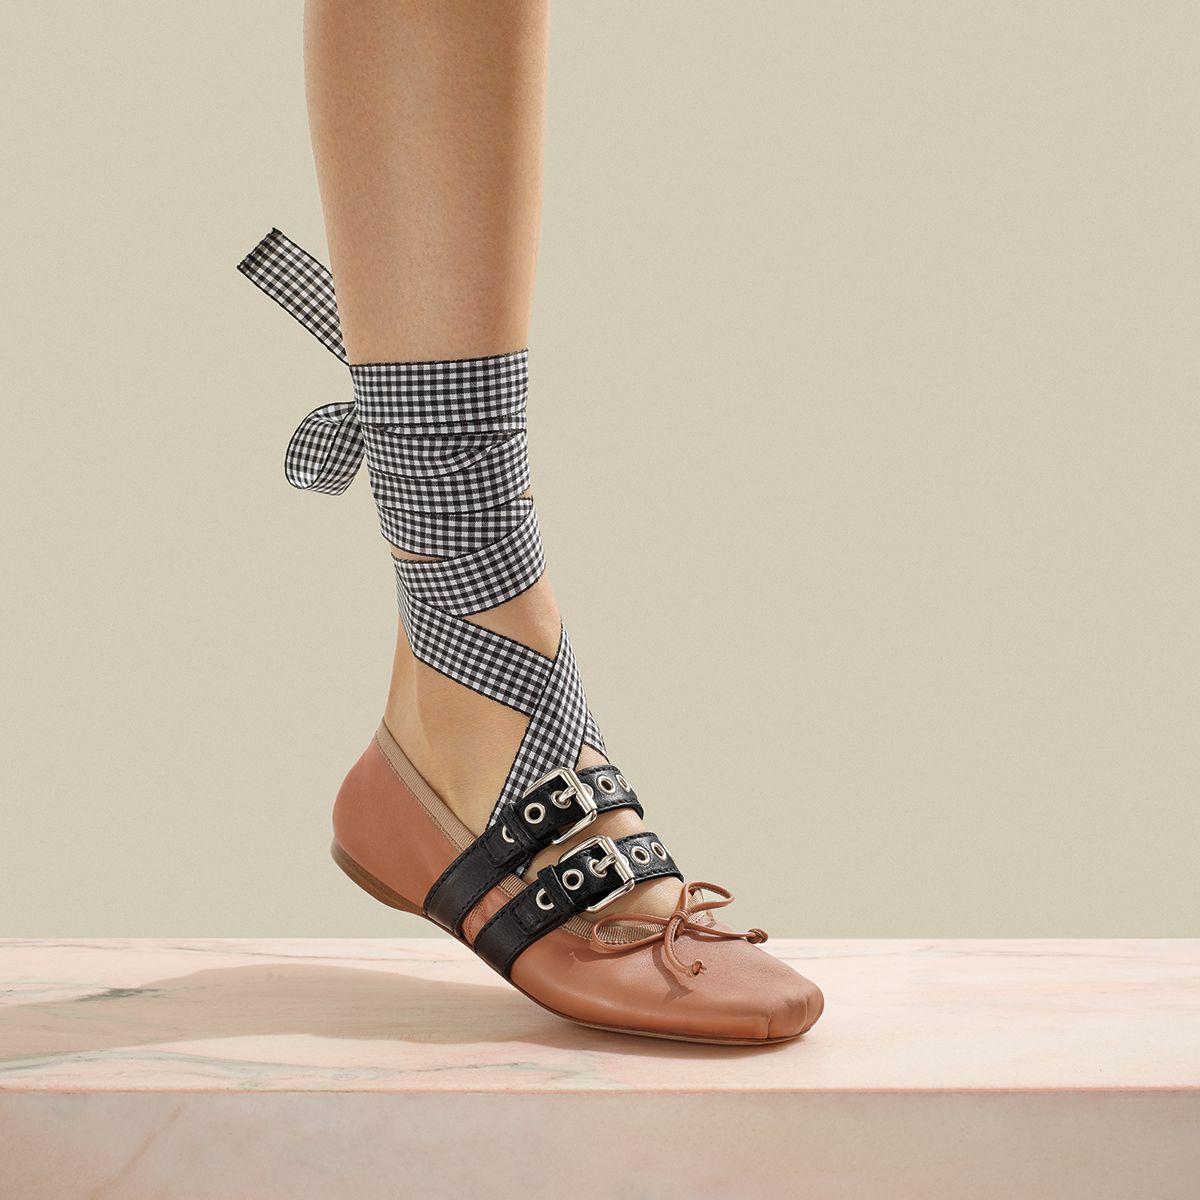 ankle tie ballerinas - Black Miu Miu szpS4f